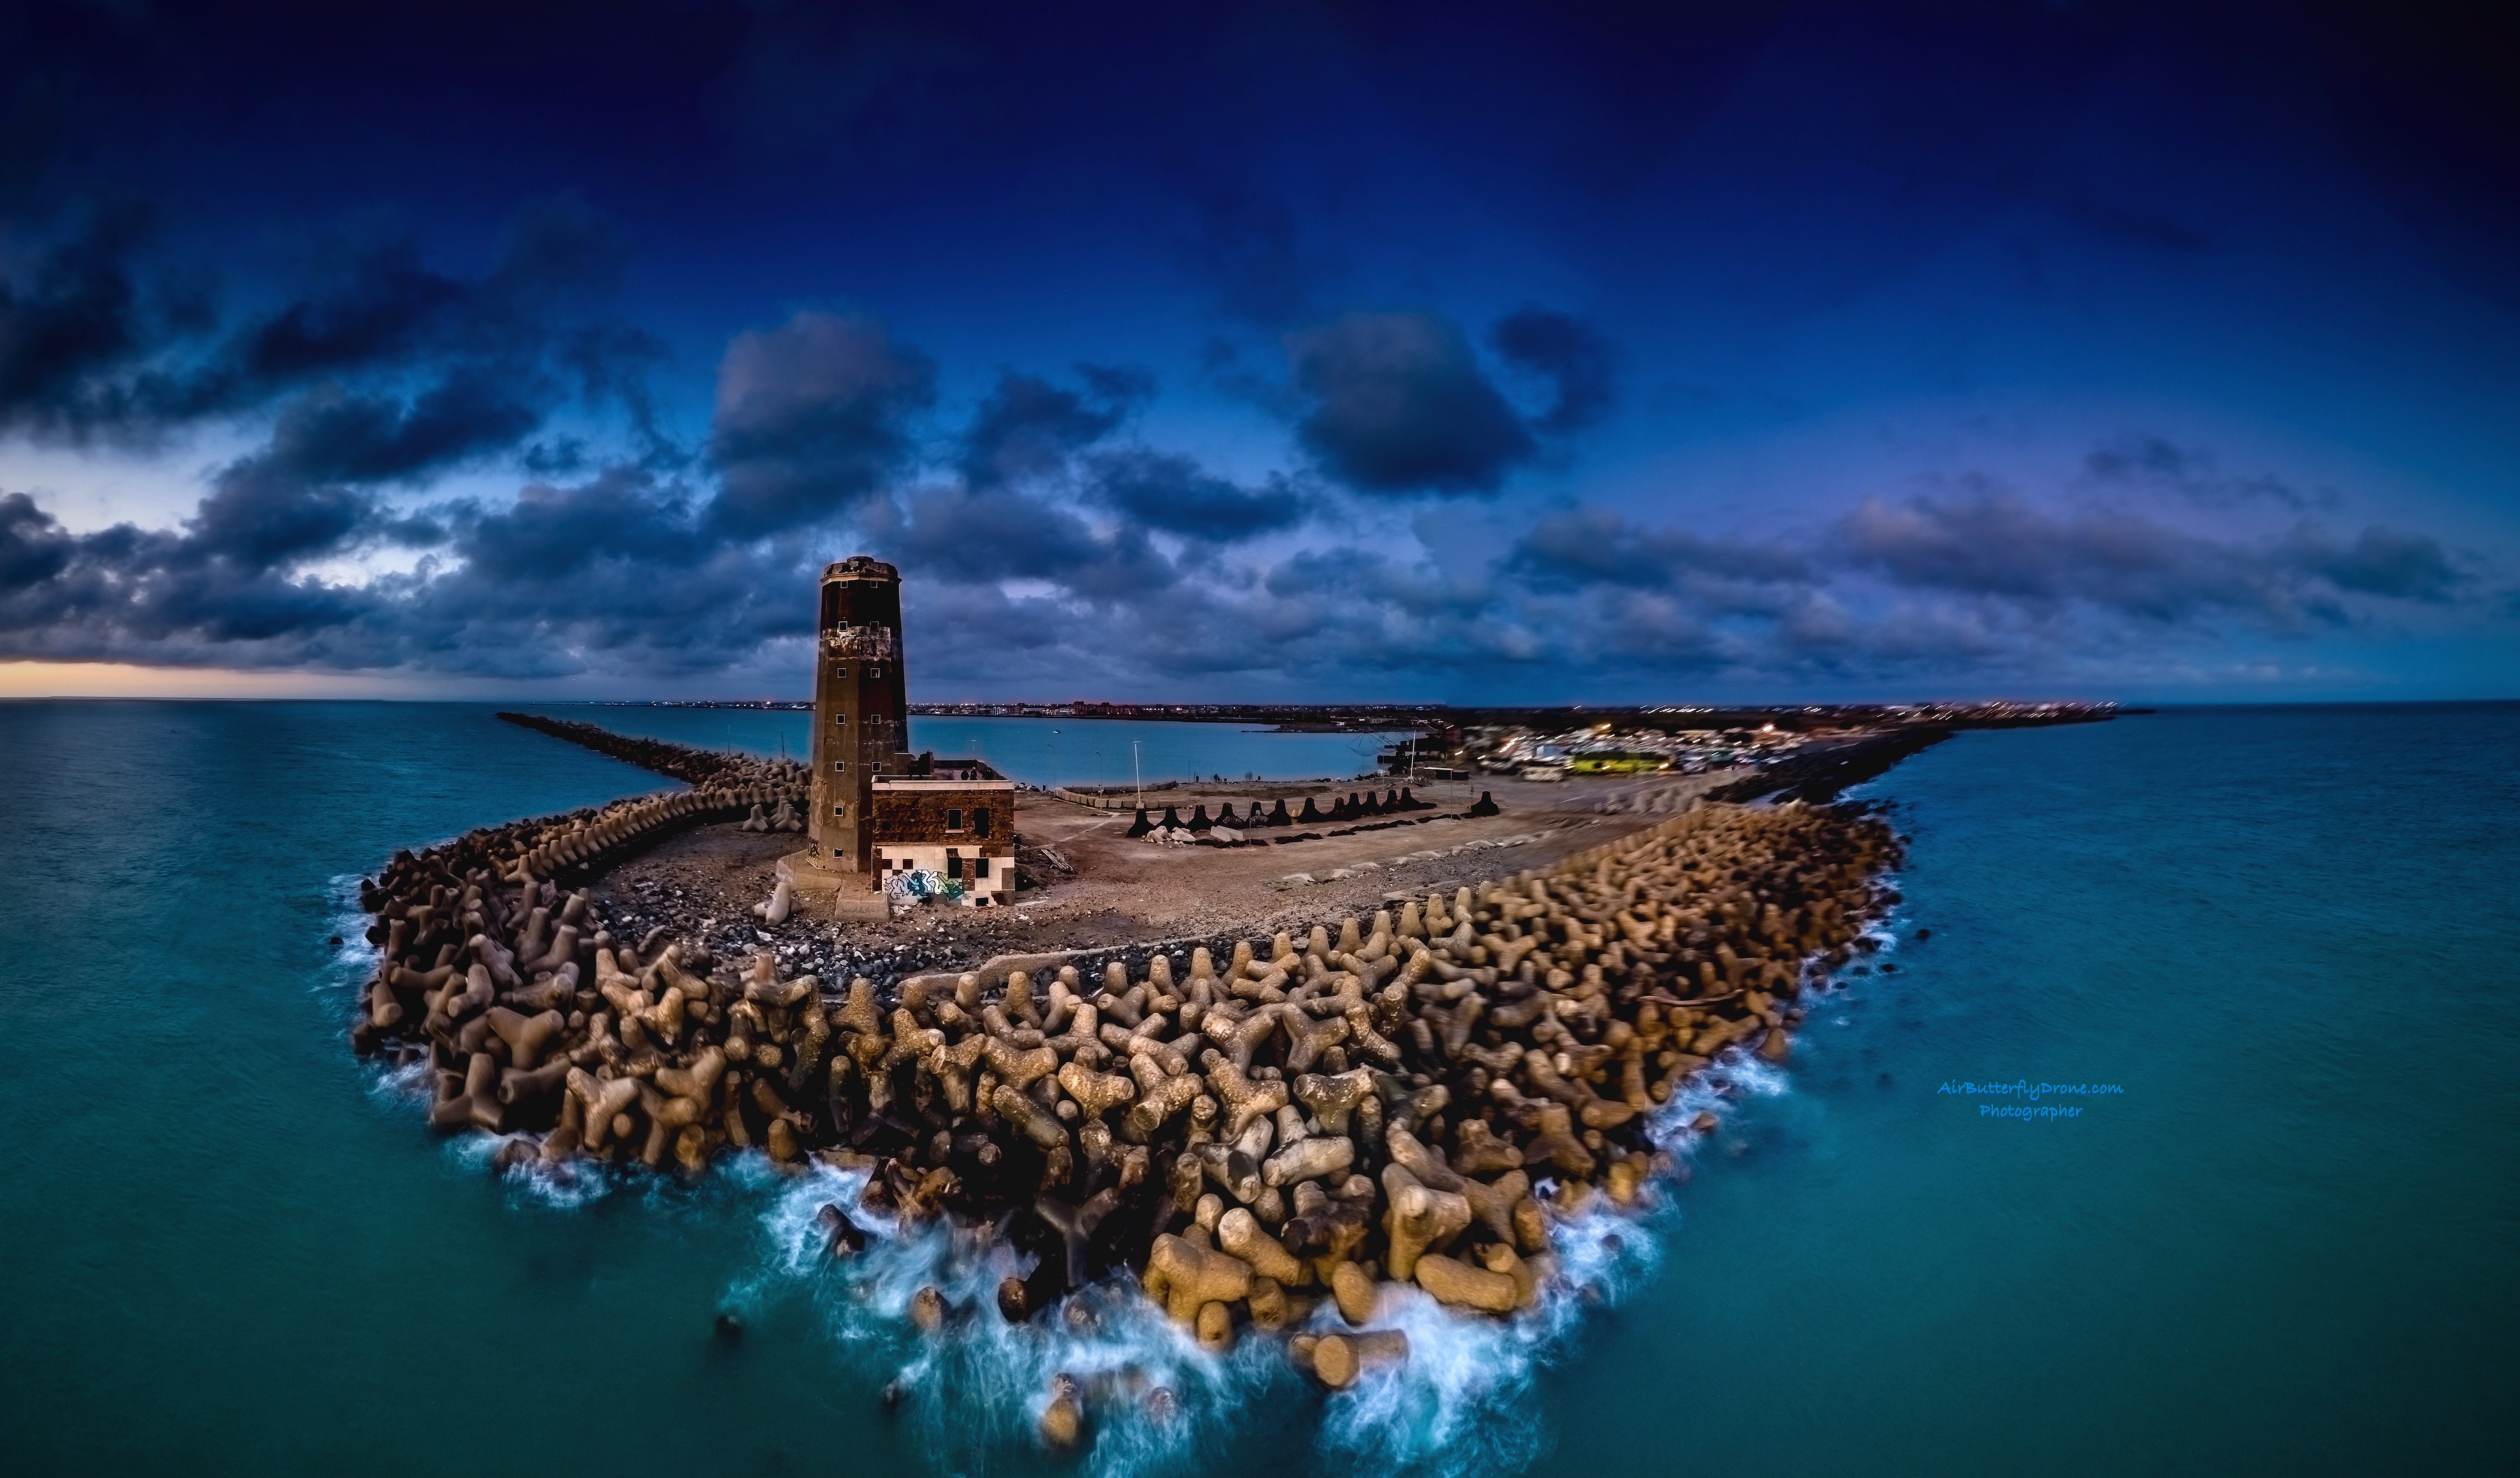 lighthouse pano longexposure.jpeg